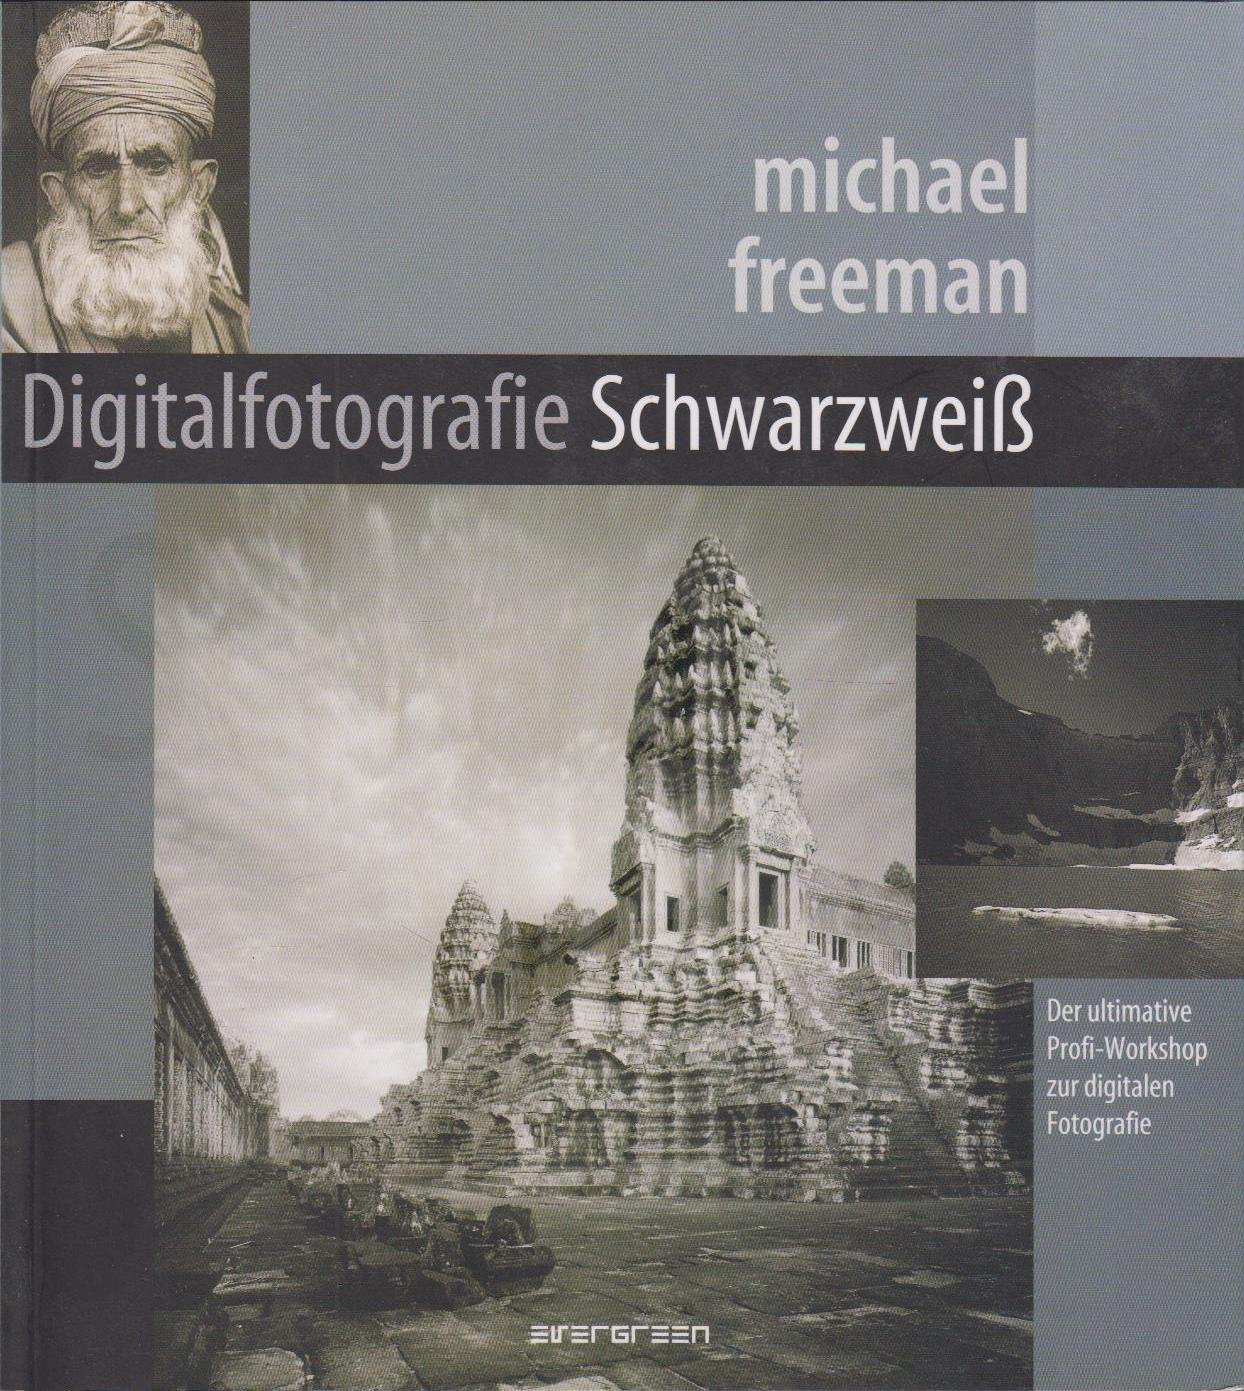 Digitale Fotografie Schwarz /Weiss